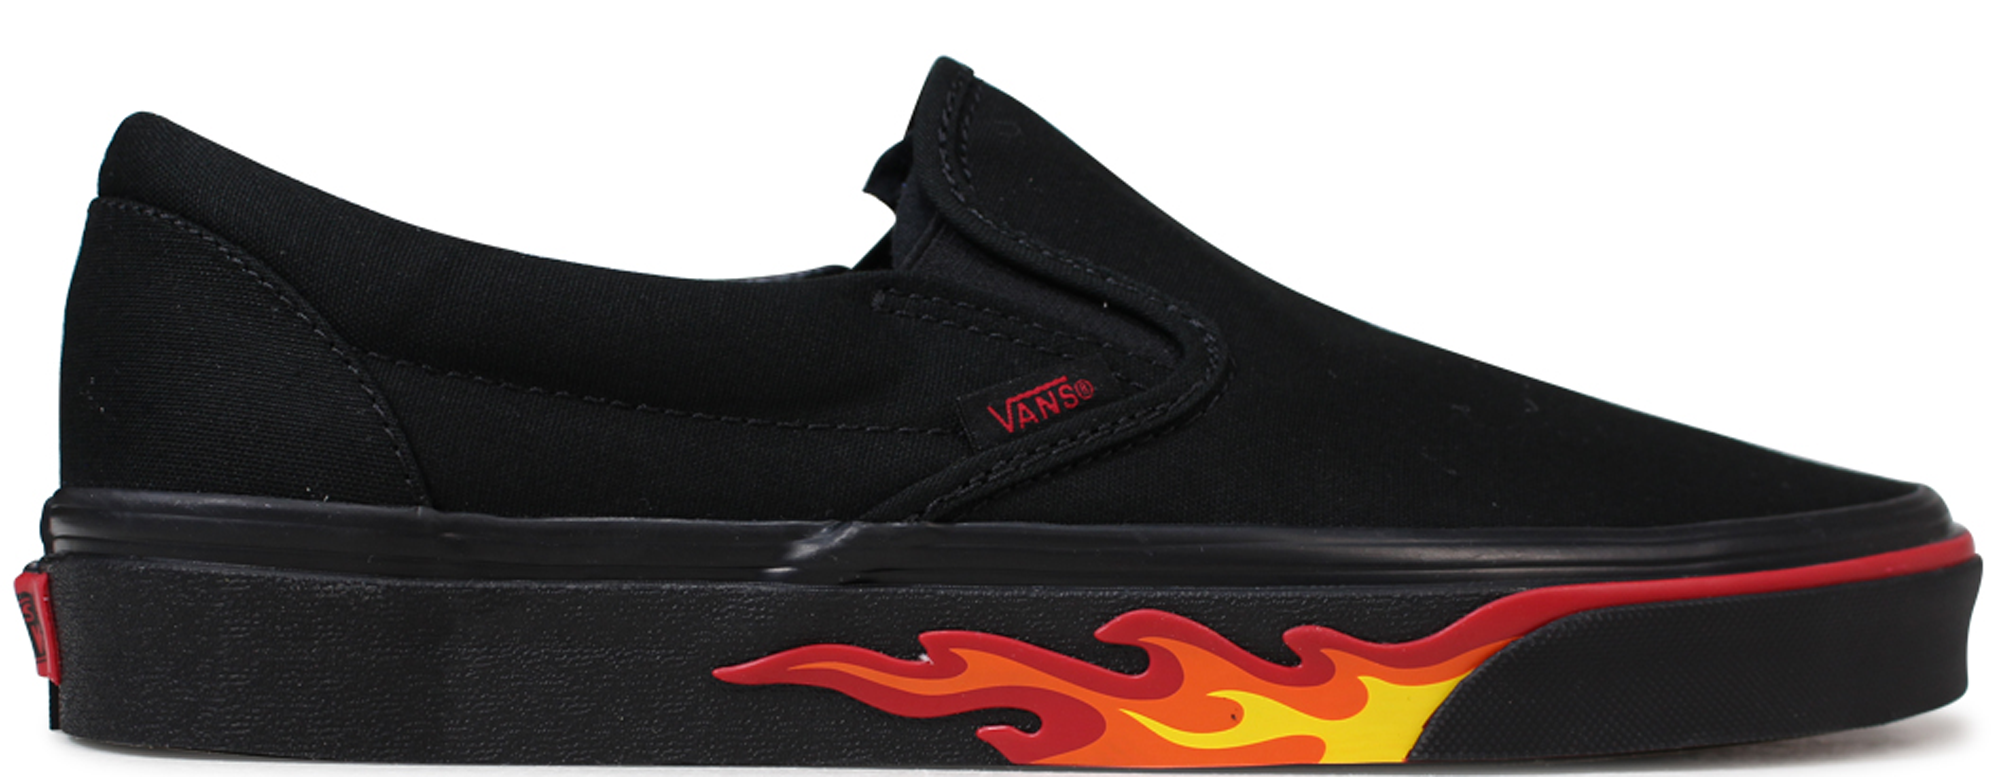 Vans Slip-On Flame Wall - VN0A38F7Q8Q